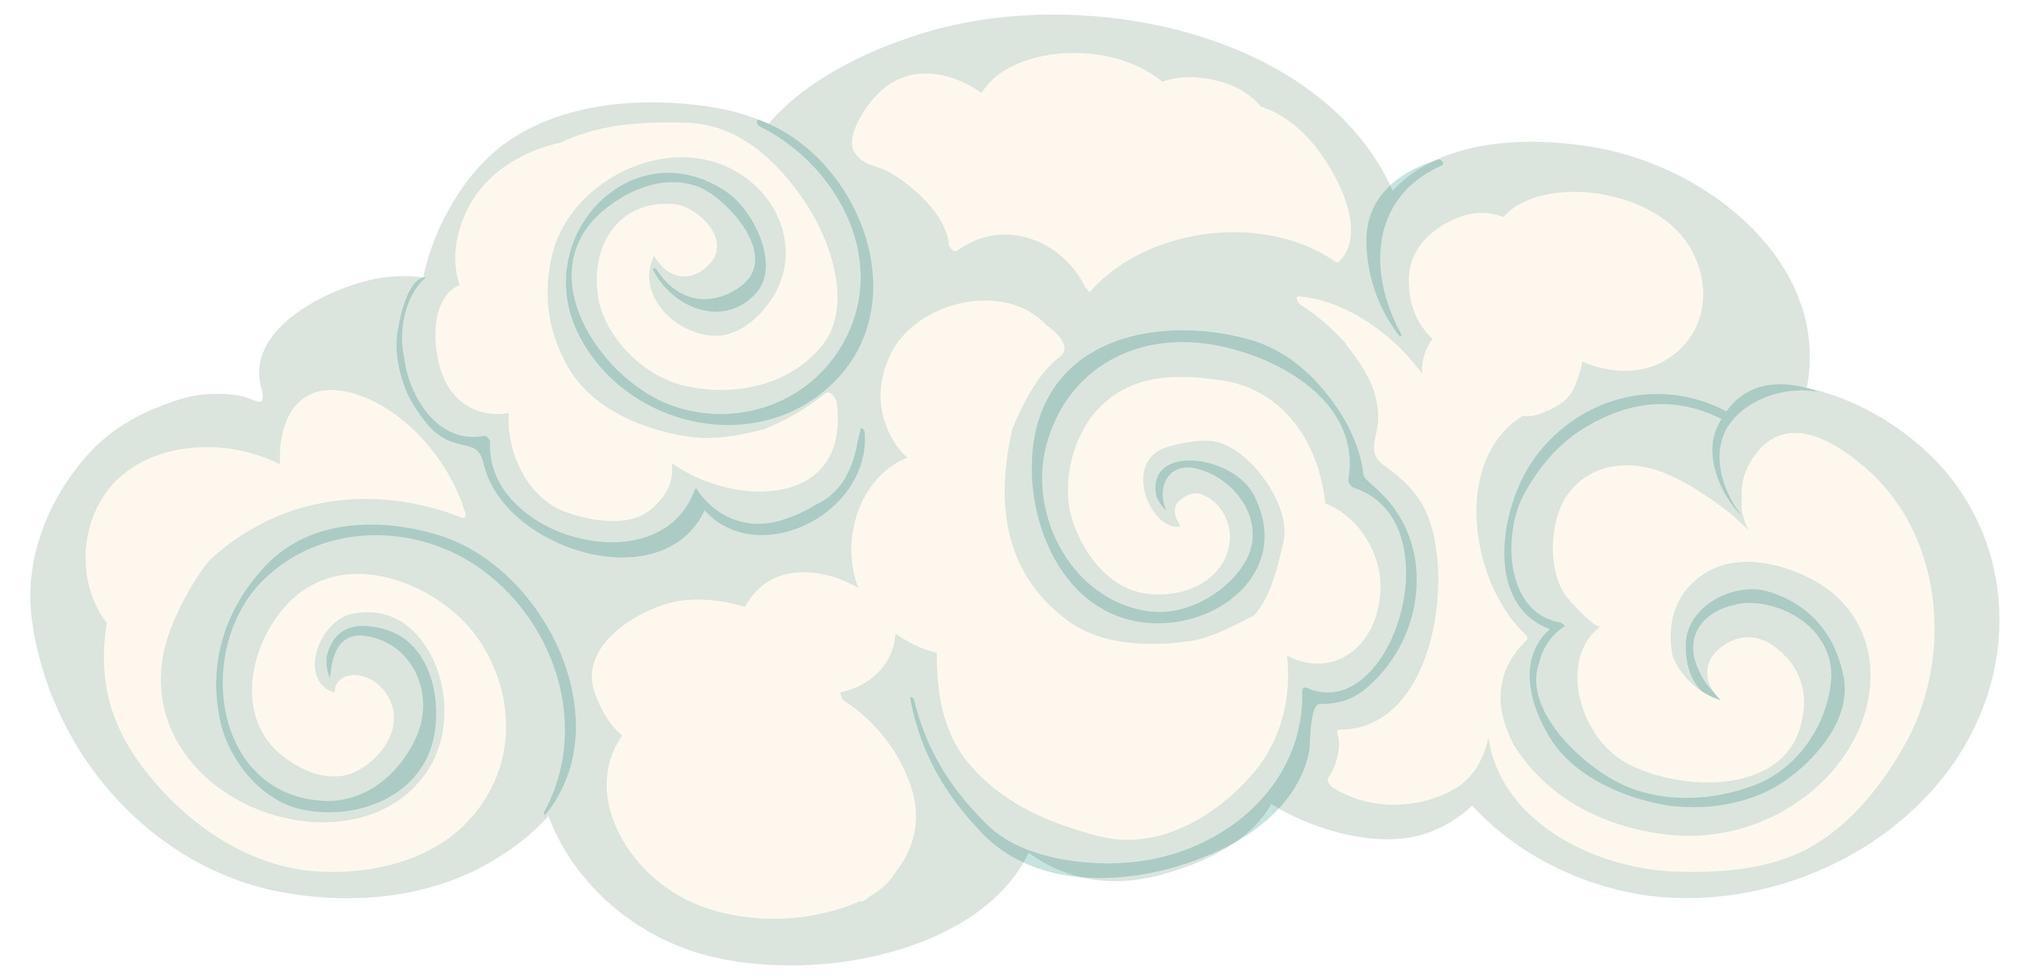 style chinois nuage isolé vecteur